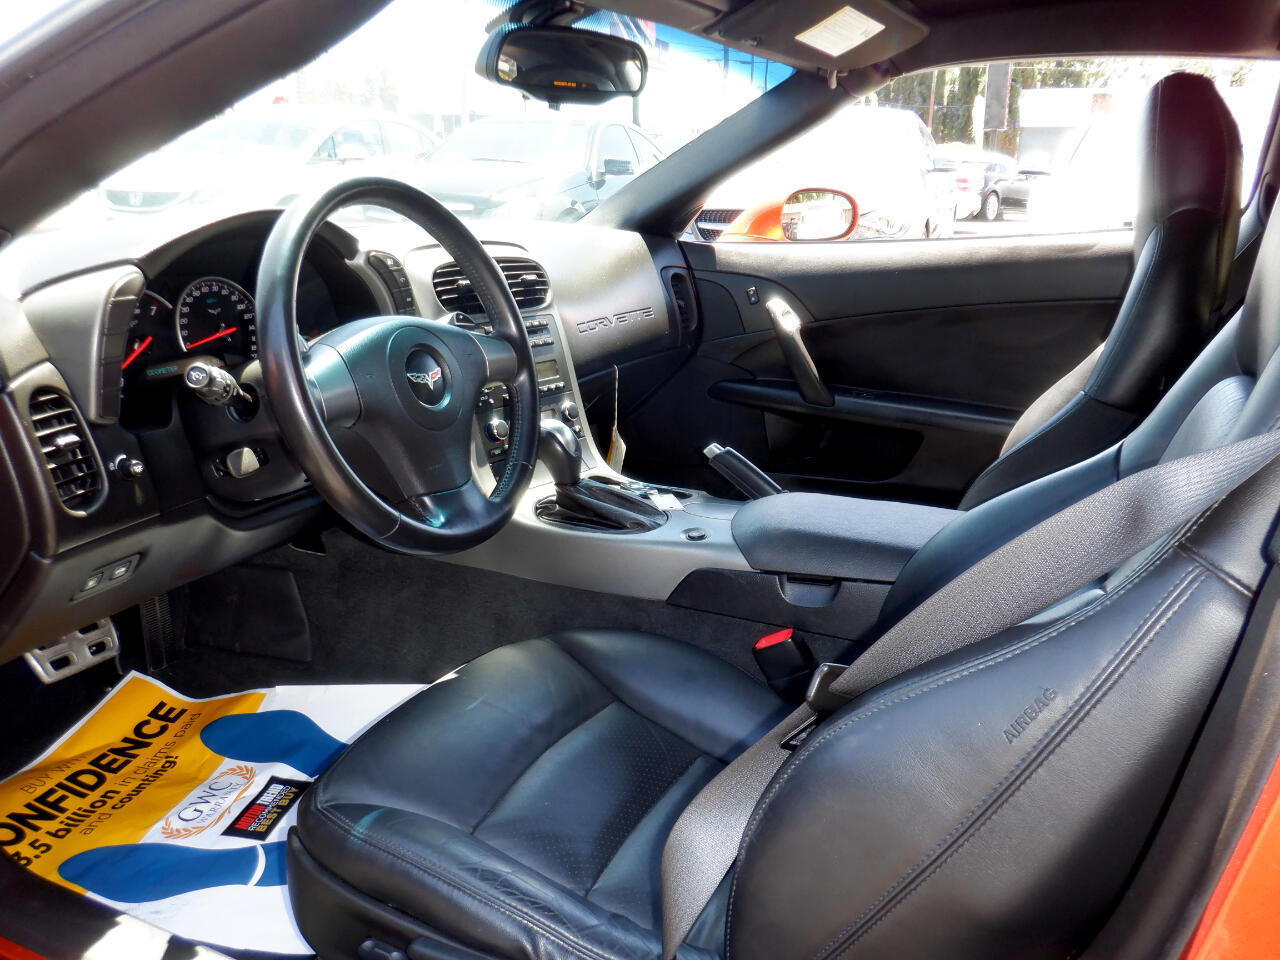 Chevrolet Corvette Coupe LT1 2007